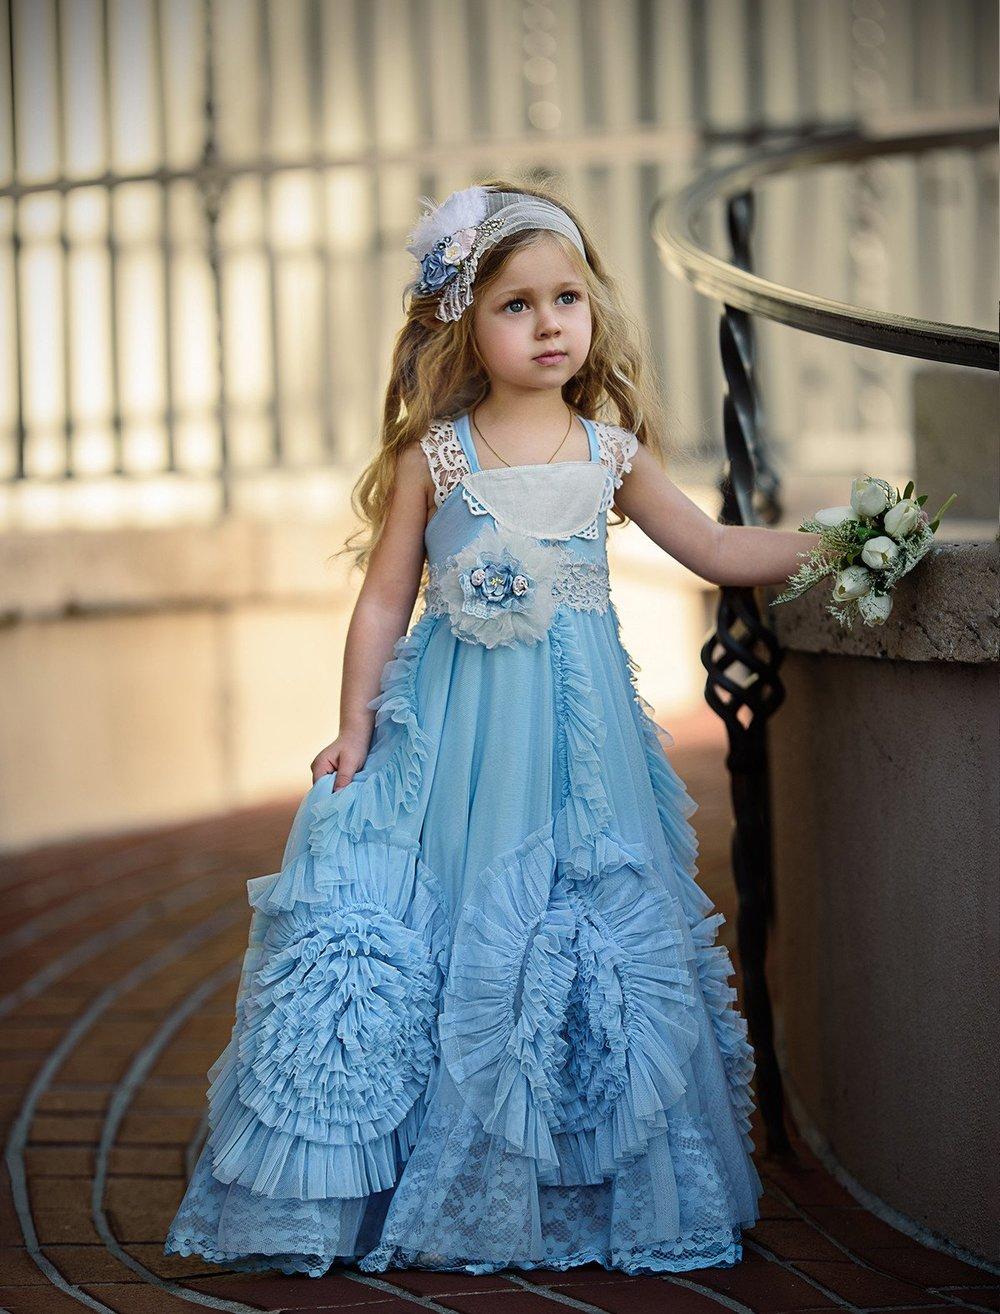 Dollcake dress - size 3T